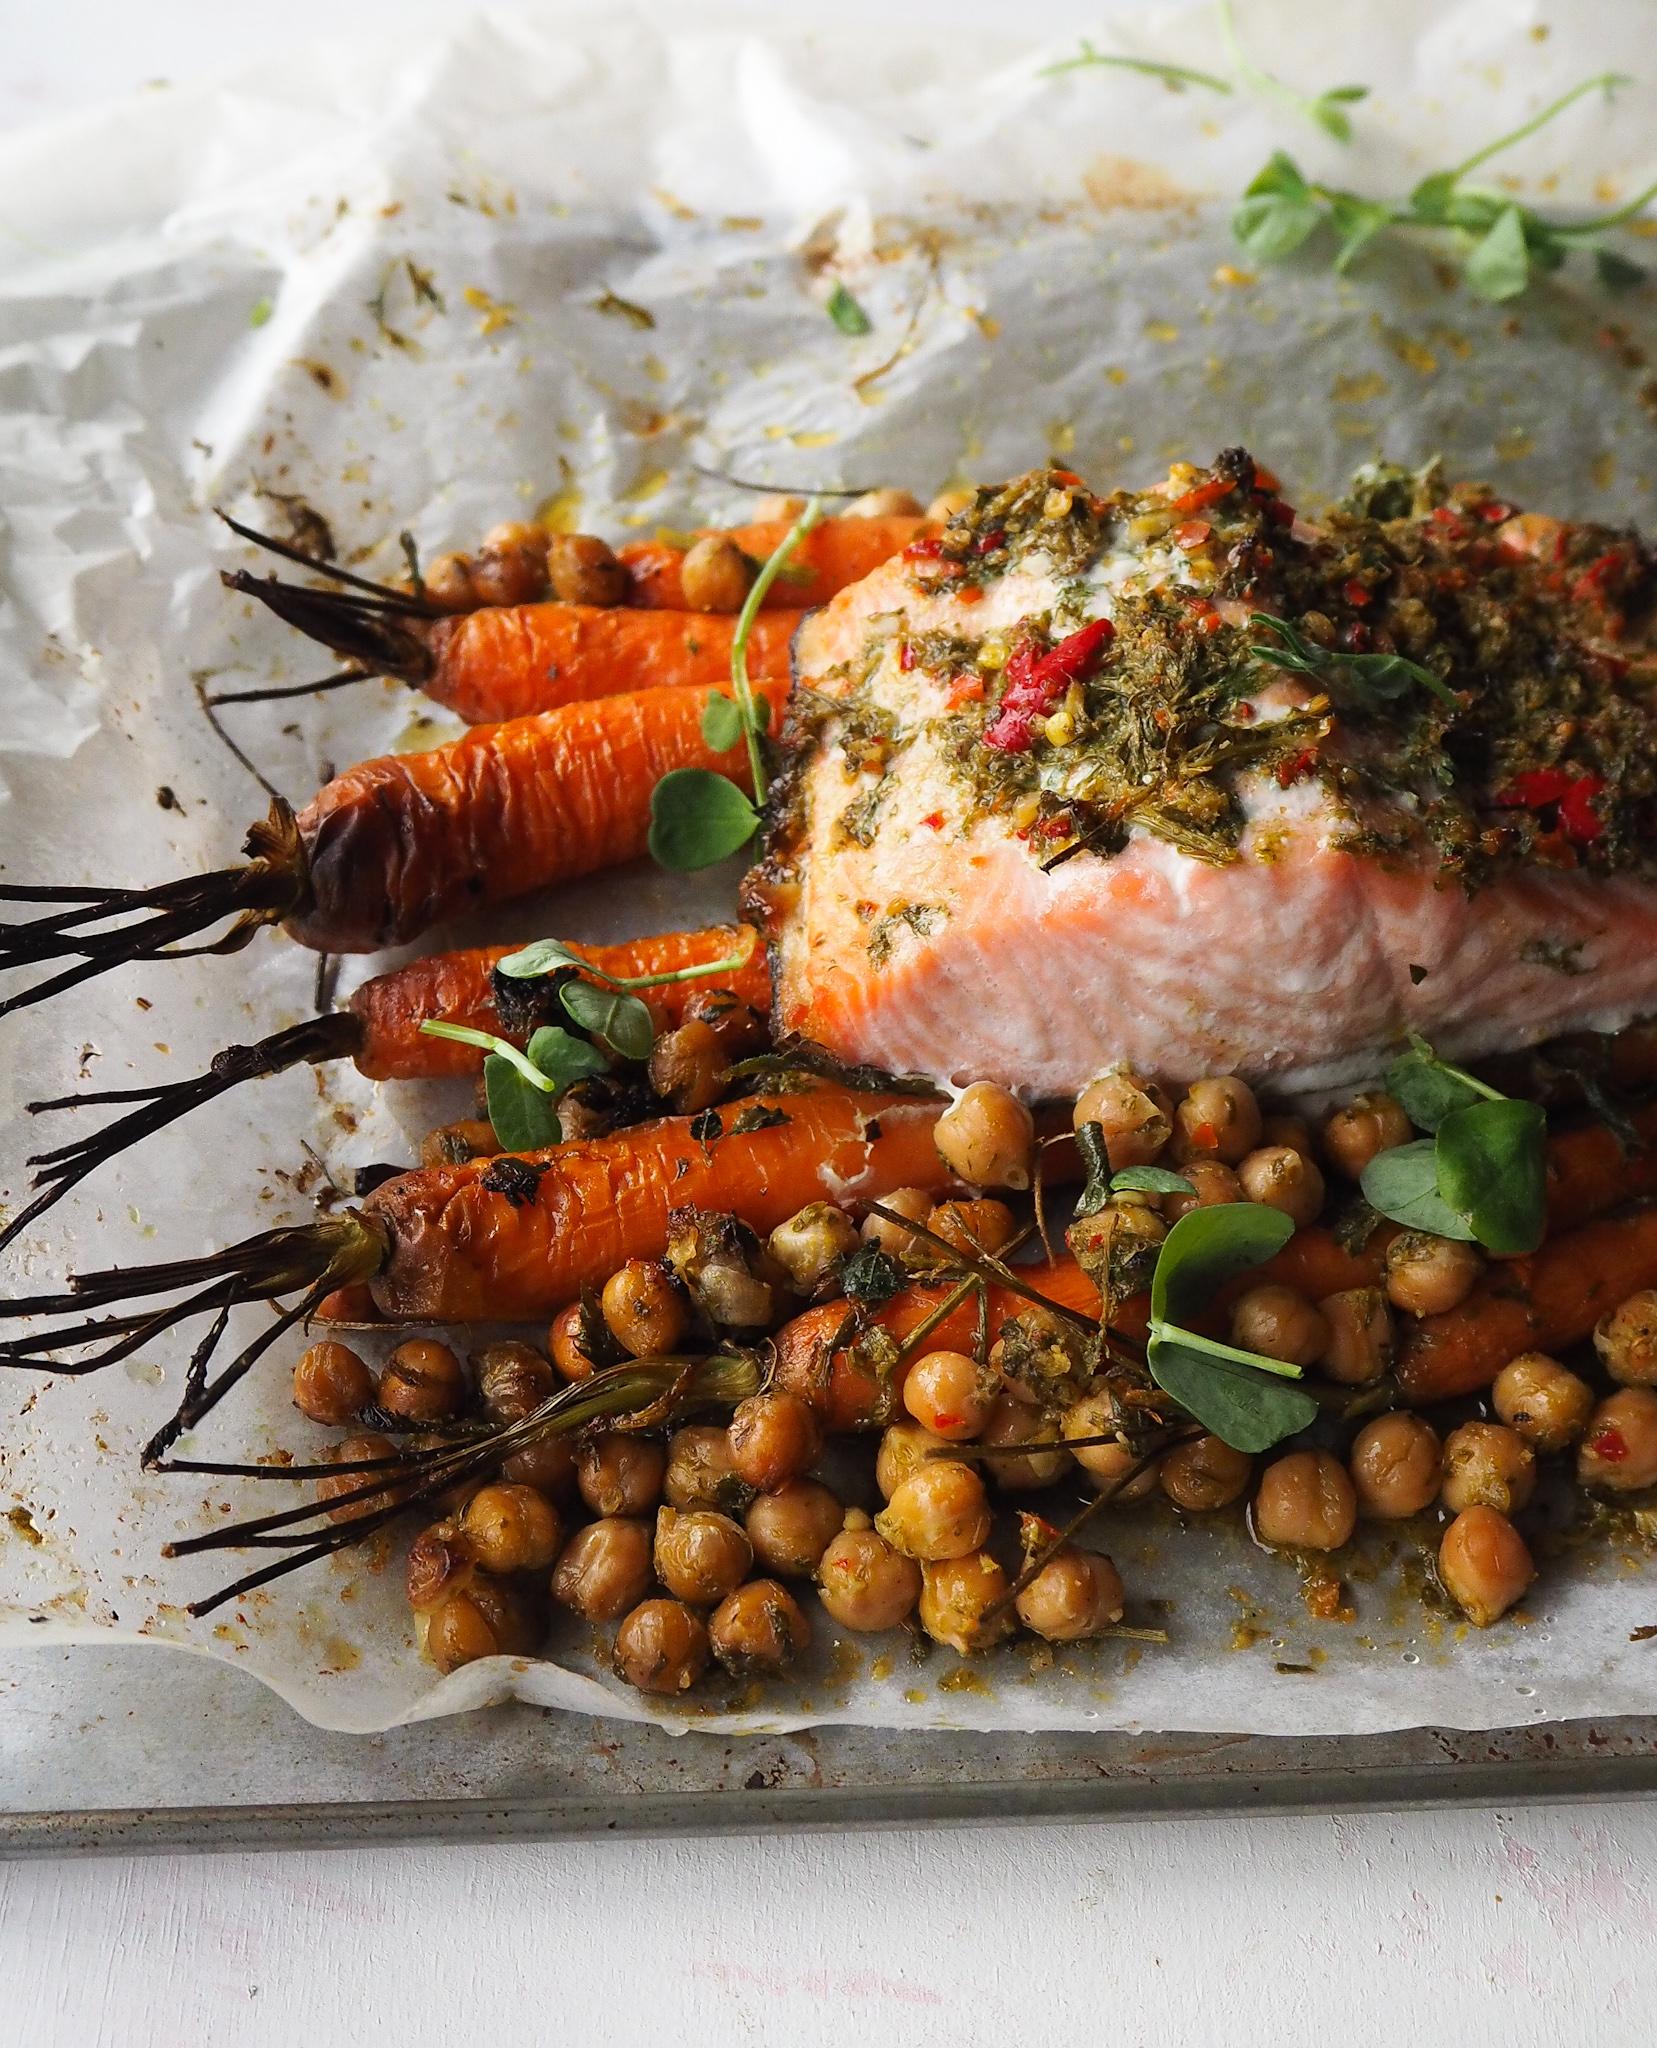 carrot top chimchurri salmon and chickpeas